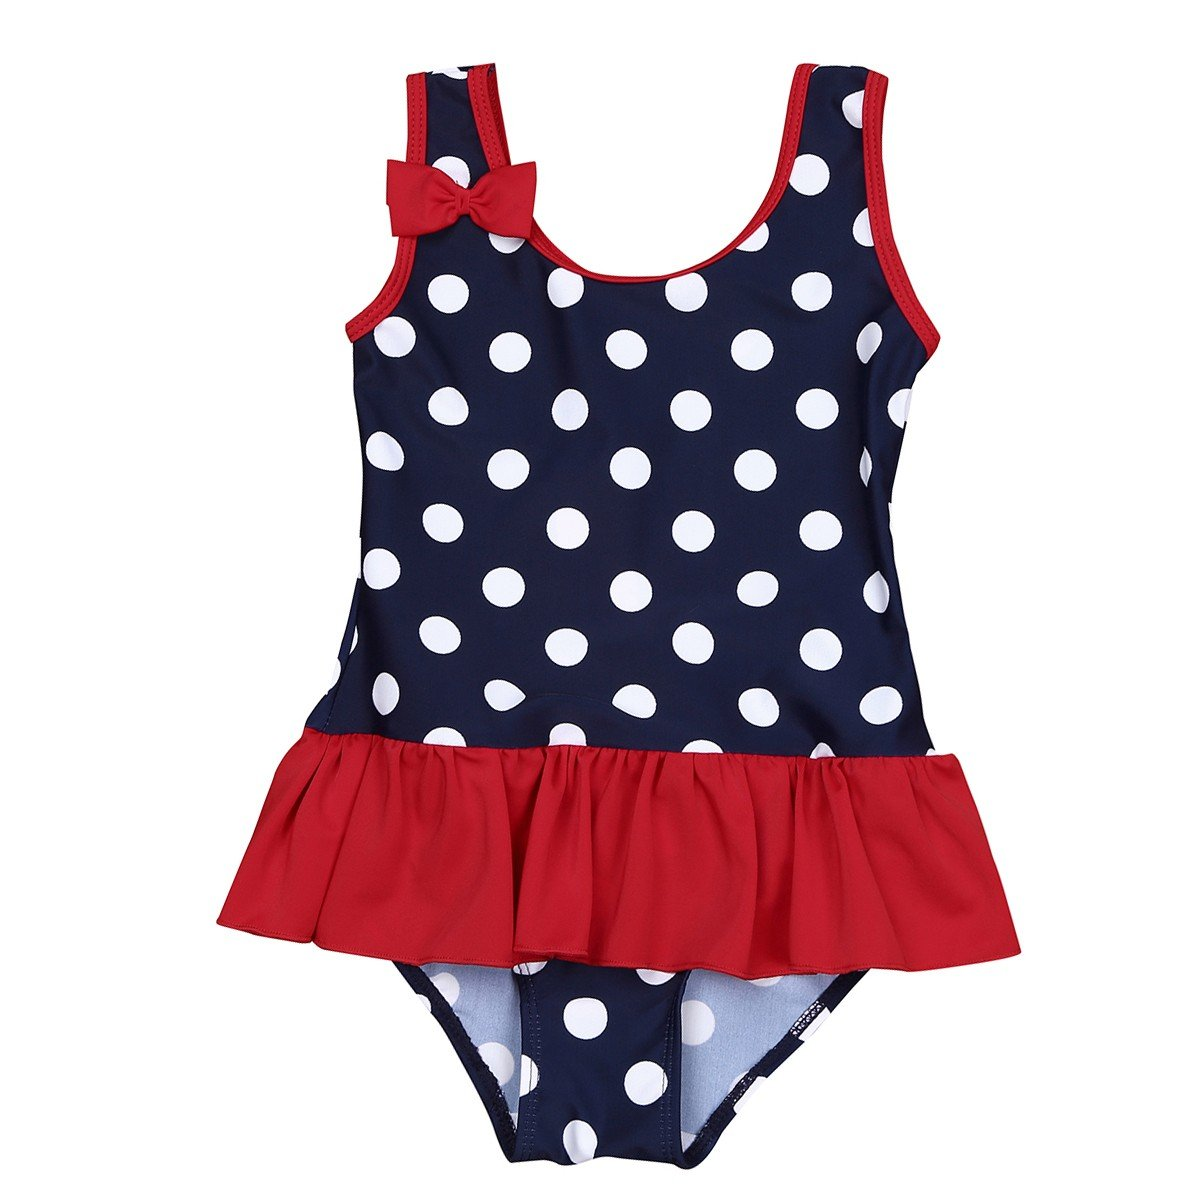 TiaoBug Infant Baby Girls One-Piece Polka Dots Swimsuit Ruffle Skirt Swimwear Bathing Suit